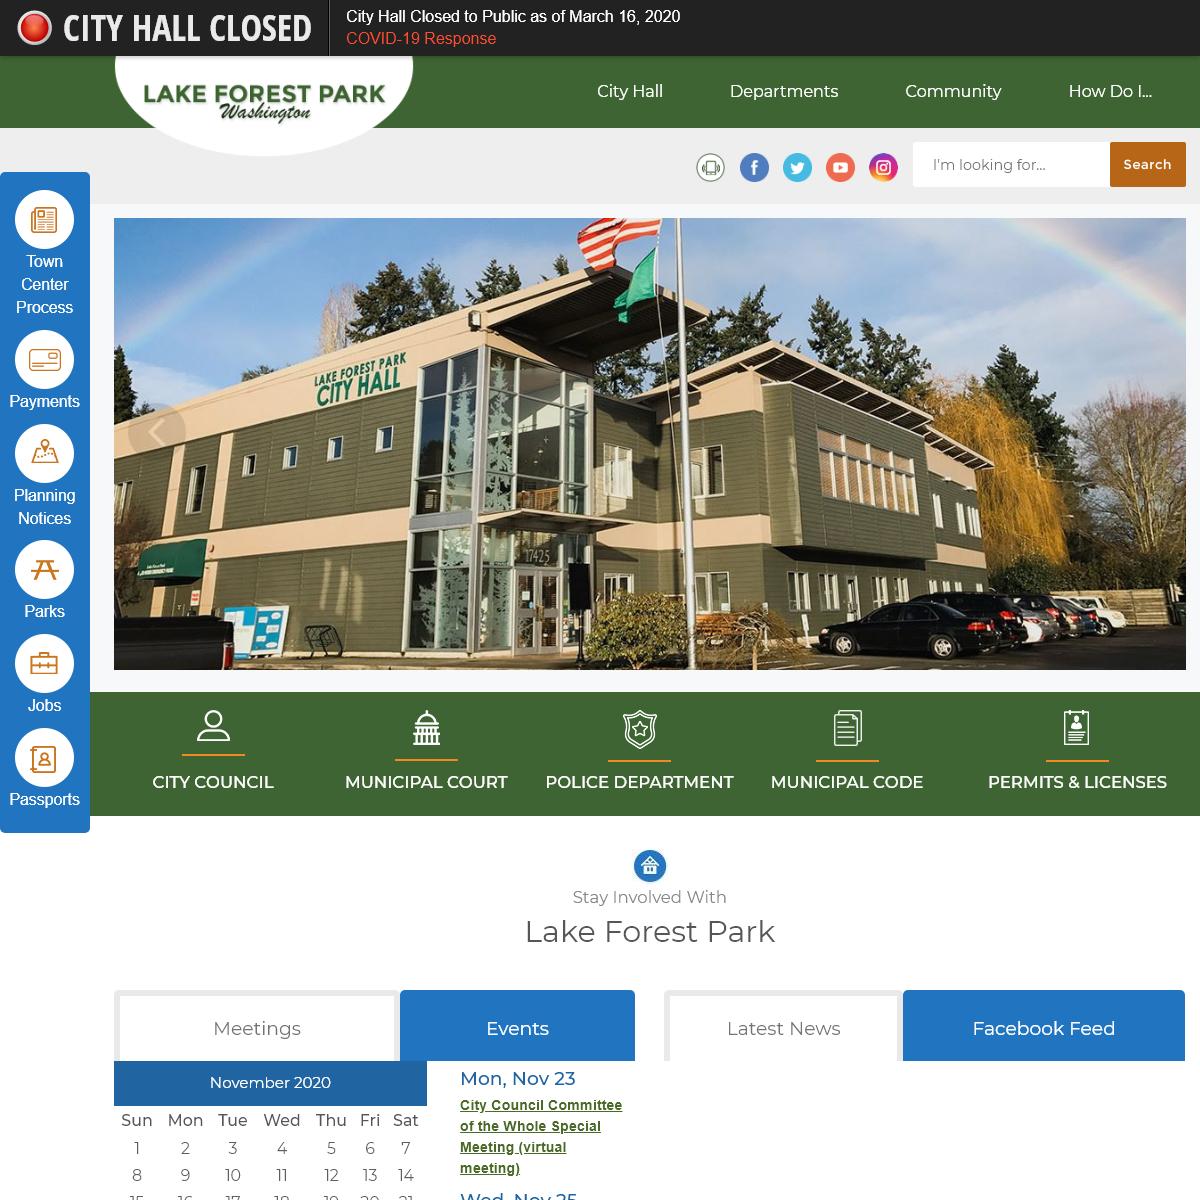 Lake Forest Park, WA - Official Website - Official Website